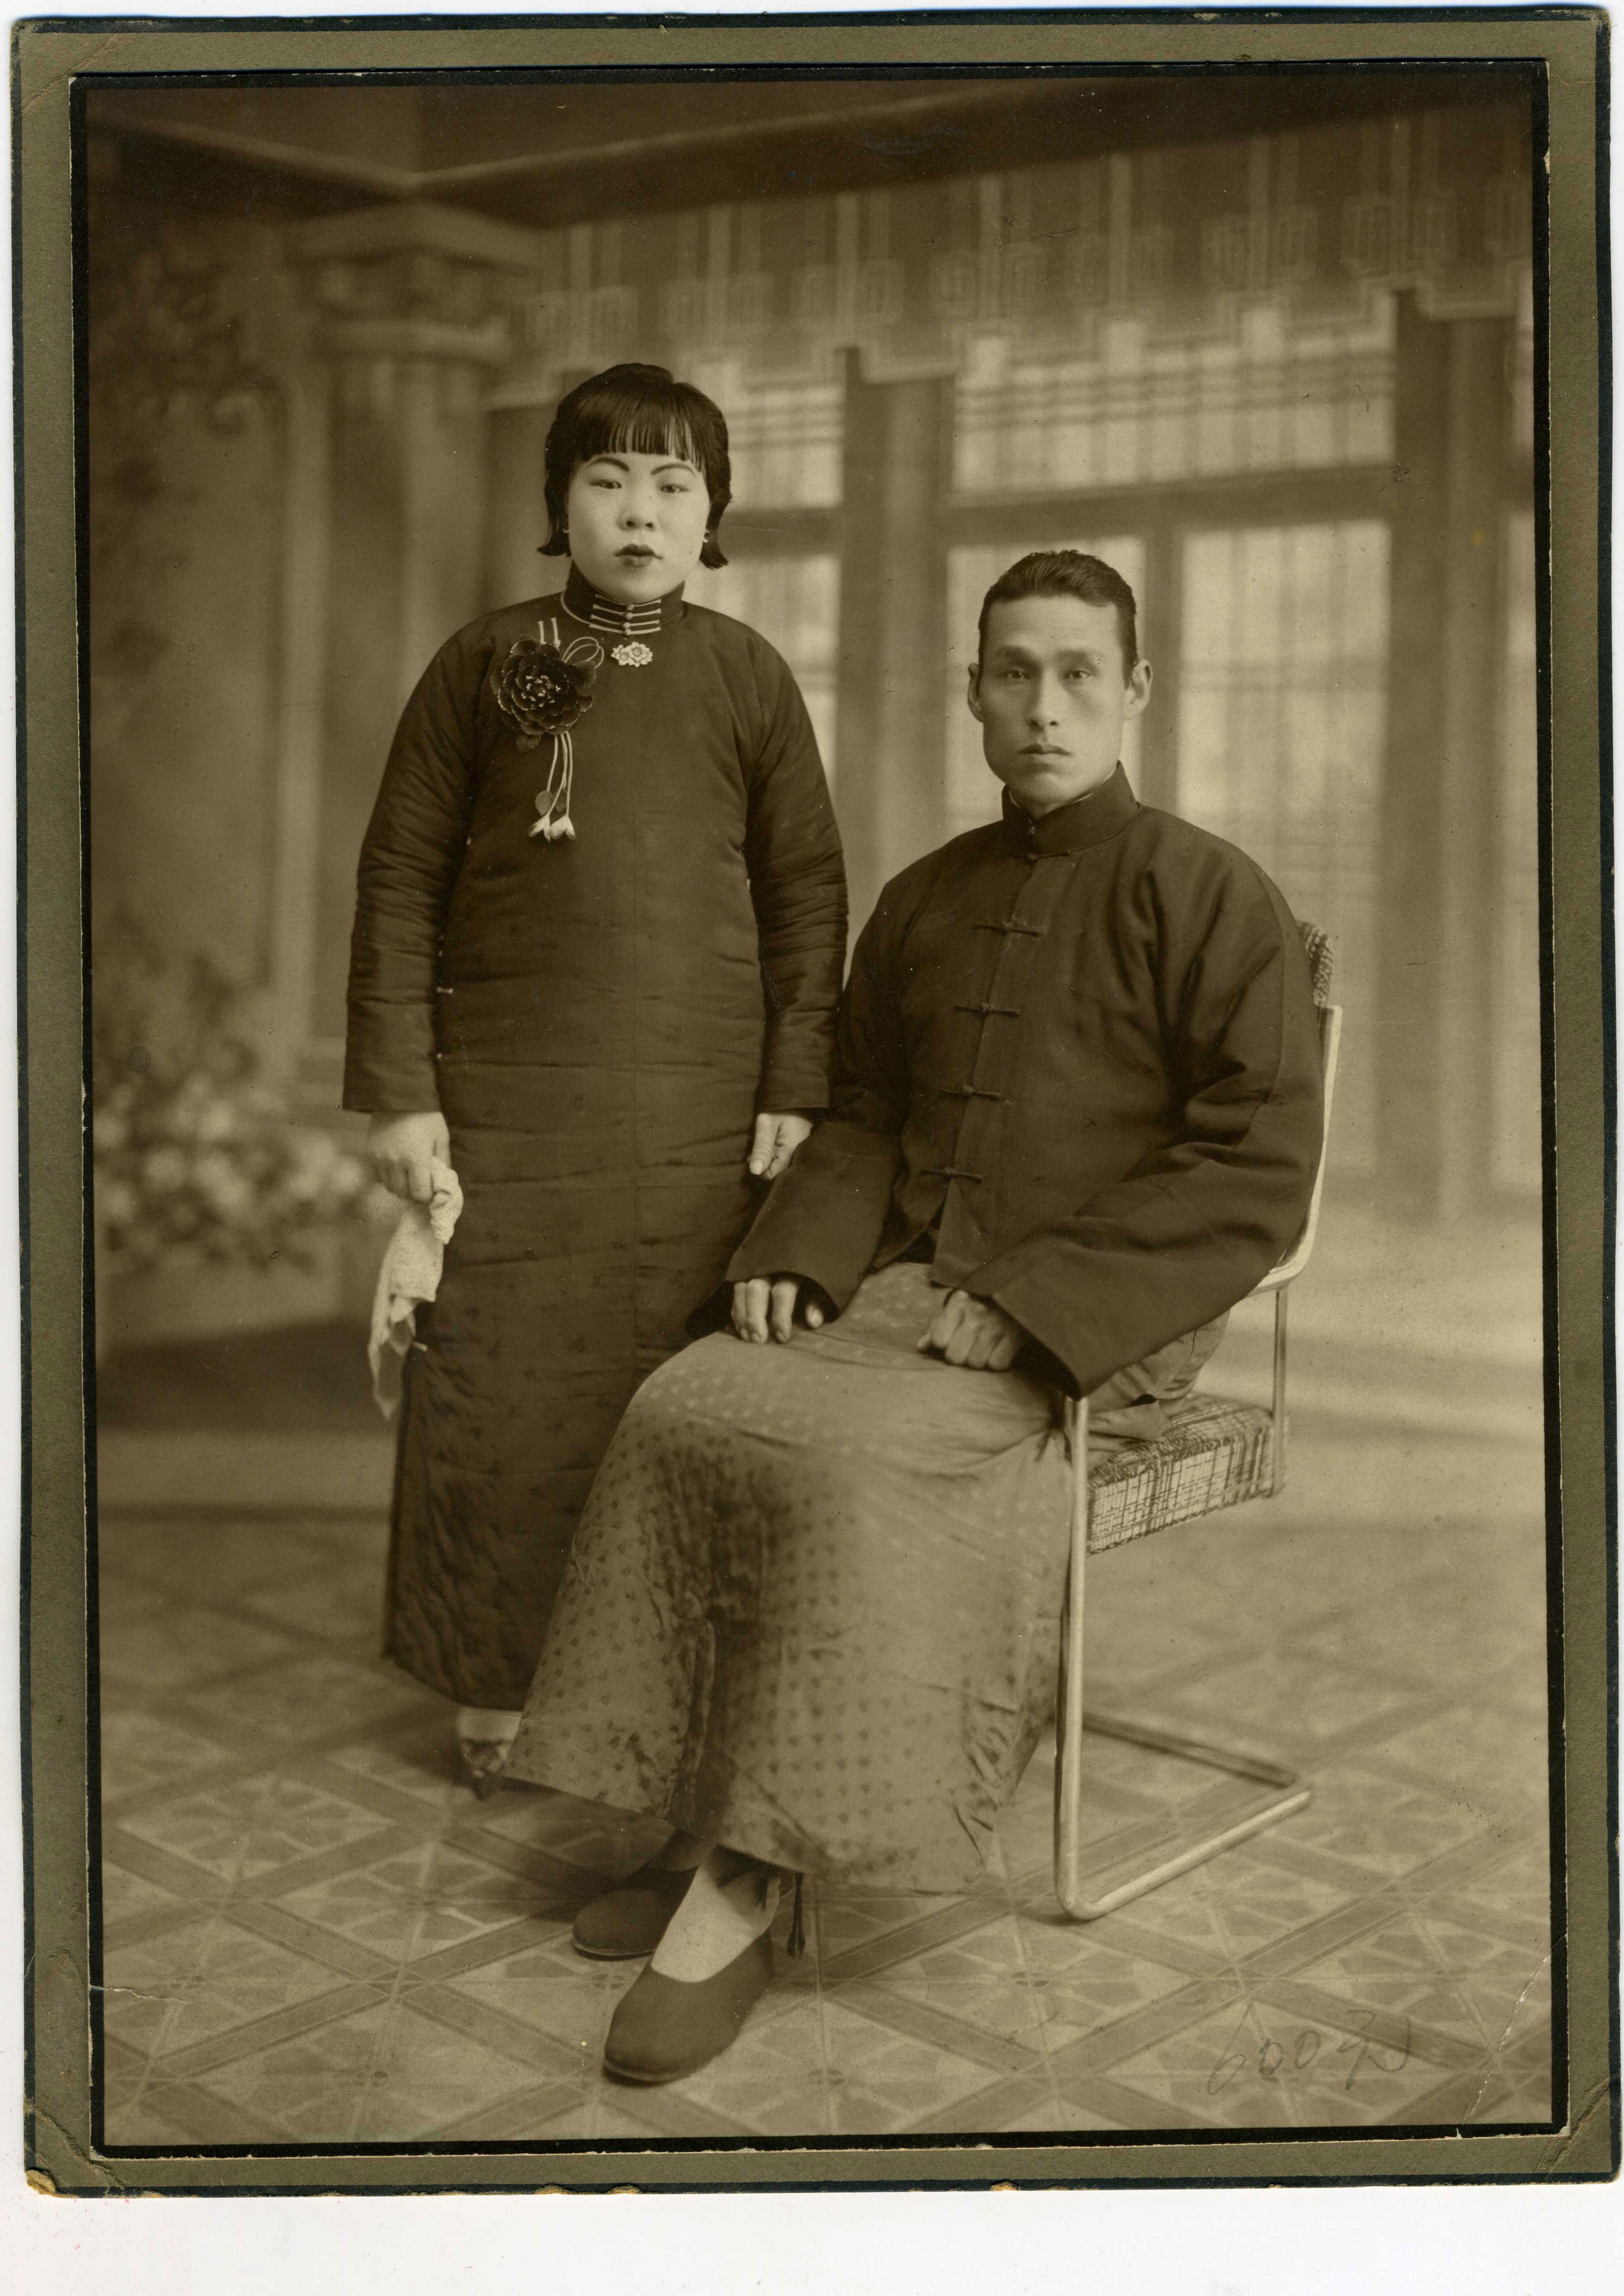 wang-qiuhang-collecting-women-nineteenth-twentieth-centuries-photography-of-china-0022.jpg